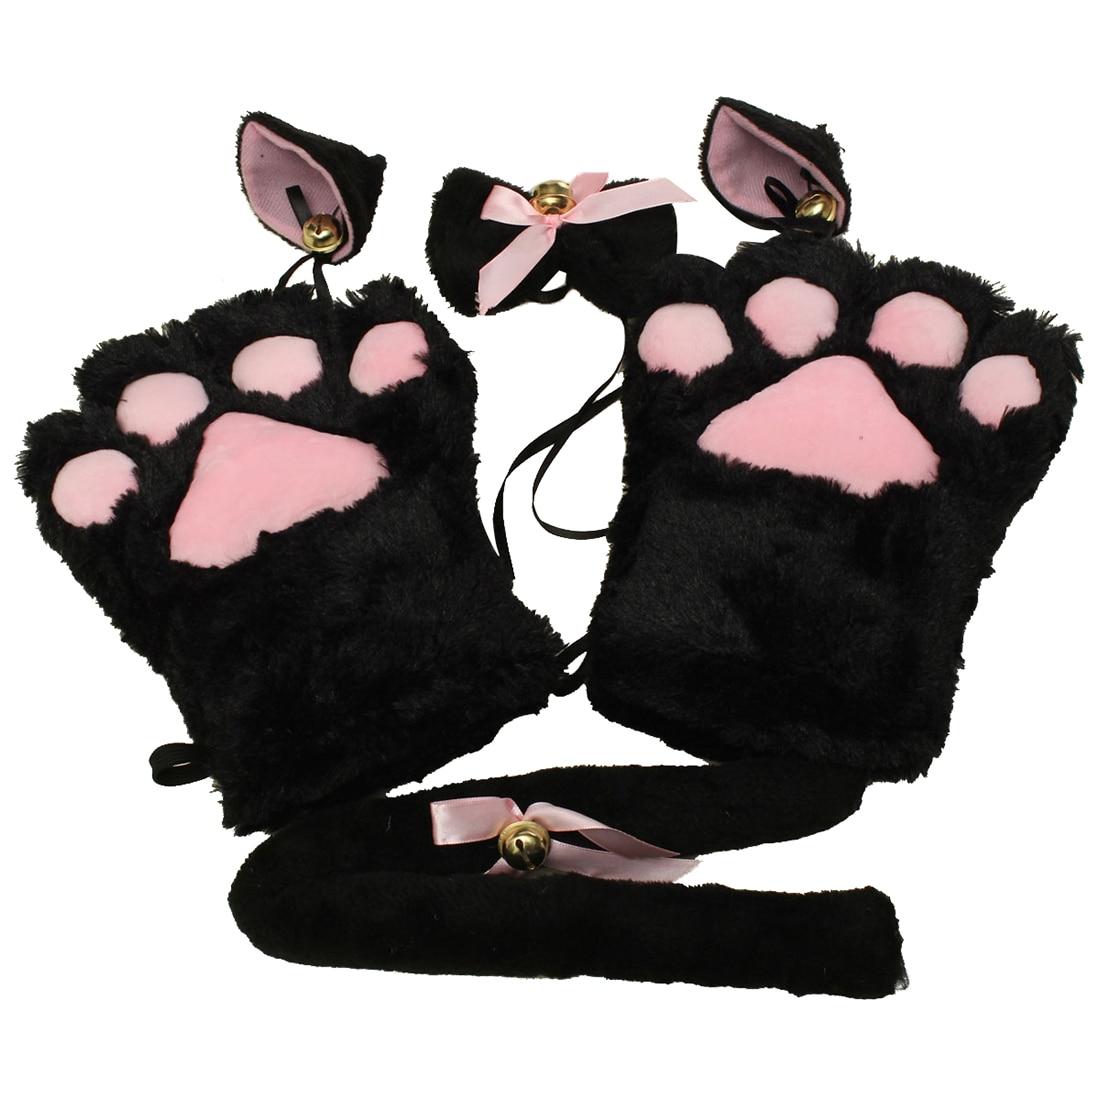 Apparel Accessories Nice Kawaii Cute Kitten Cat Ears Neko Maid Gloves Paw Ear Tail Tie Party Plush Paw Claw Anime Cute Cat Ears Gloves Set#15 Great Varieties